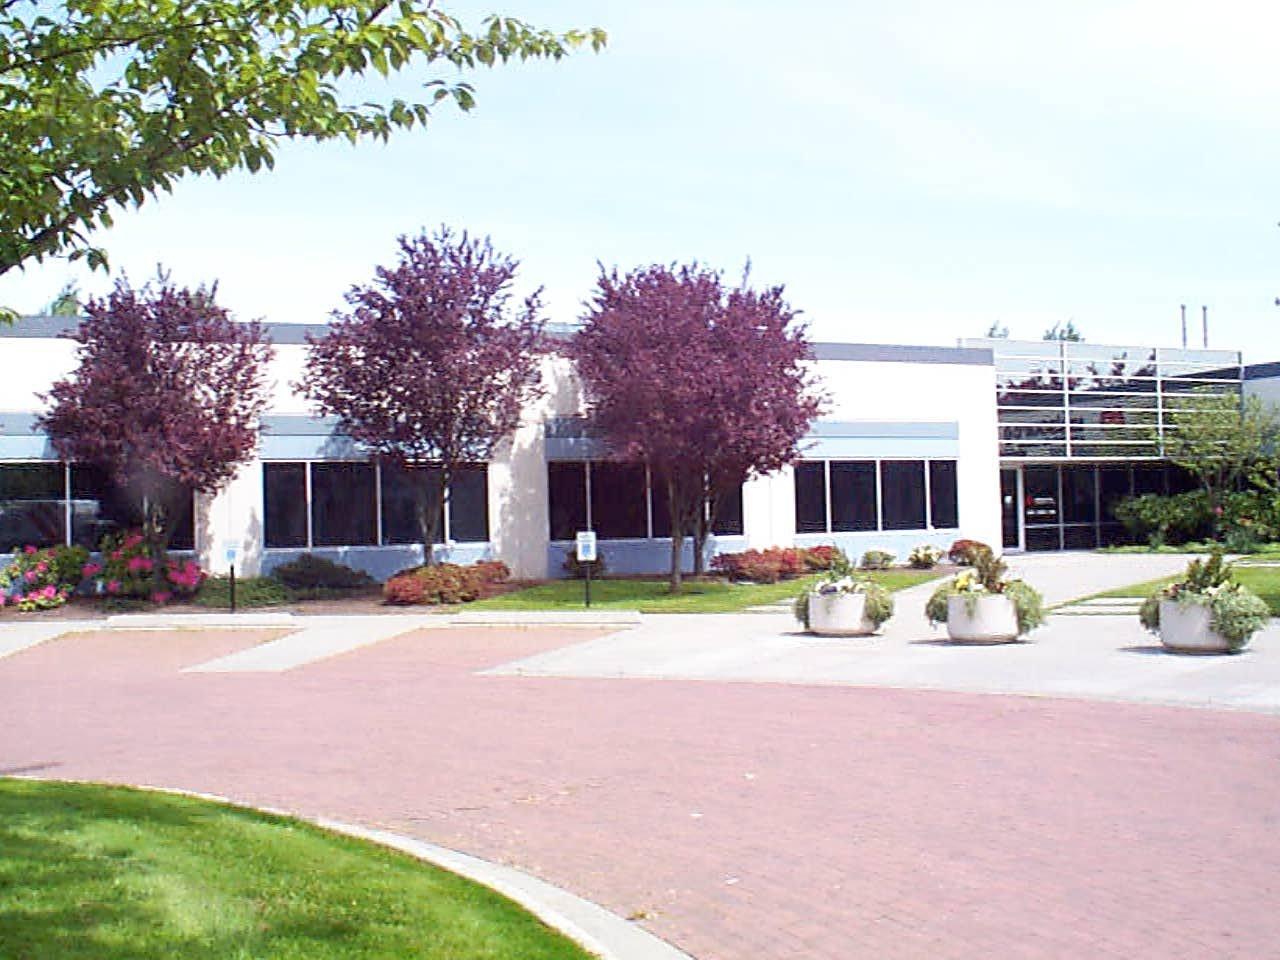 1100 Oakesdale Ave SW #220 Property Photo - Renton, WA real estate listing